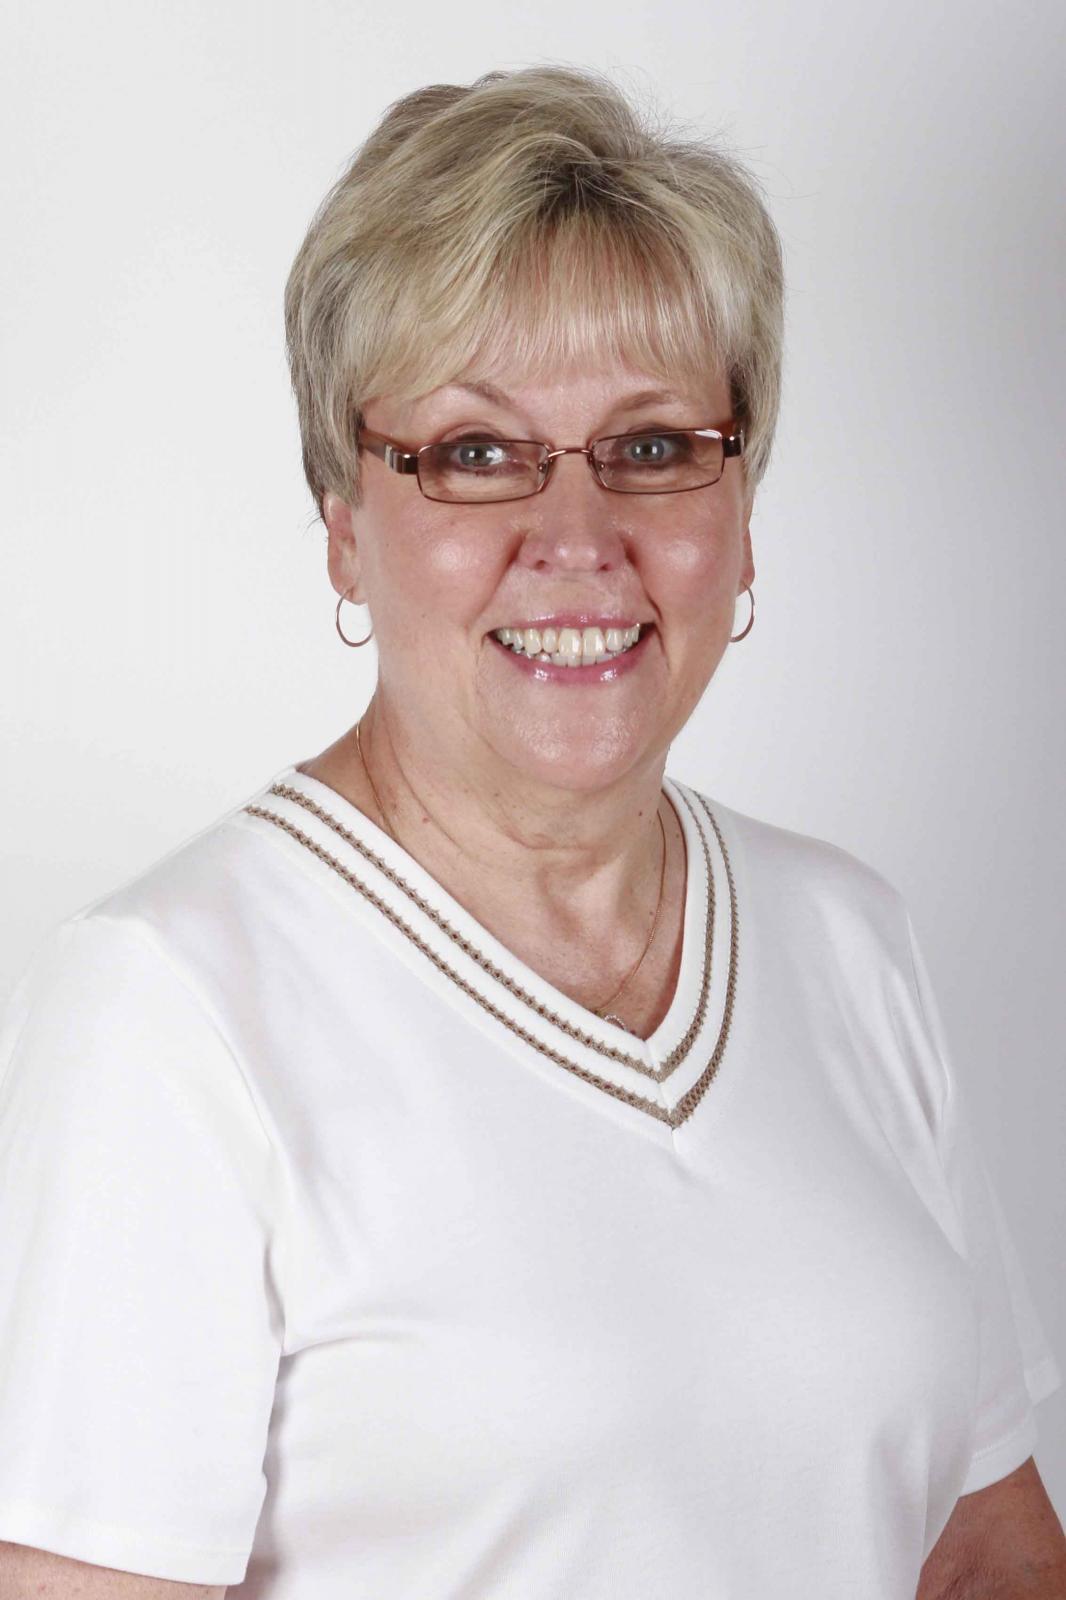 Cheryl Frank